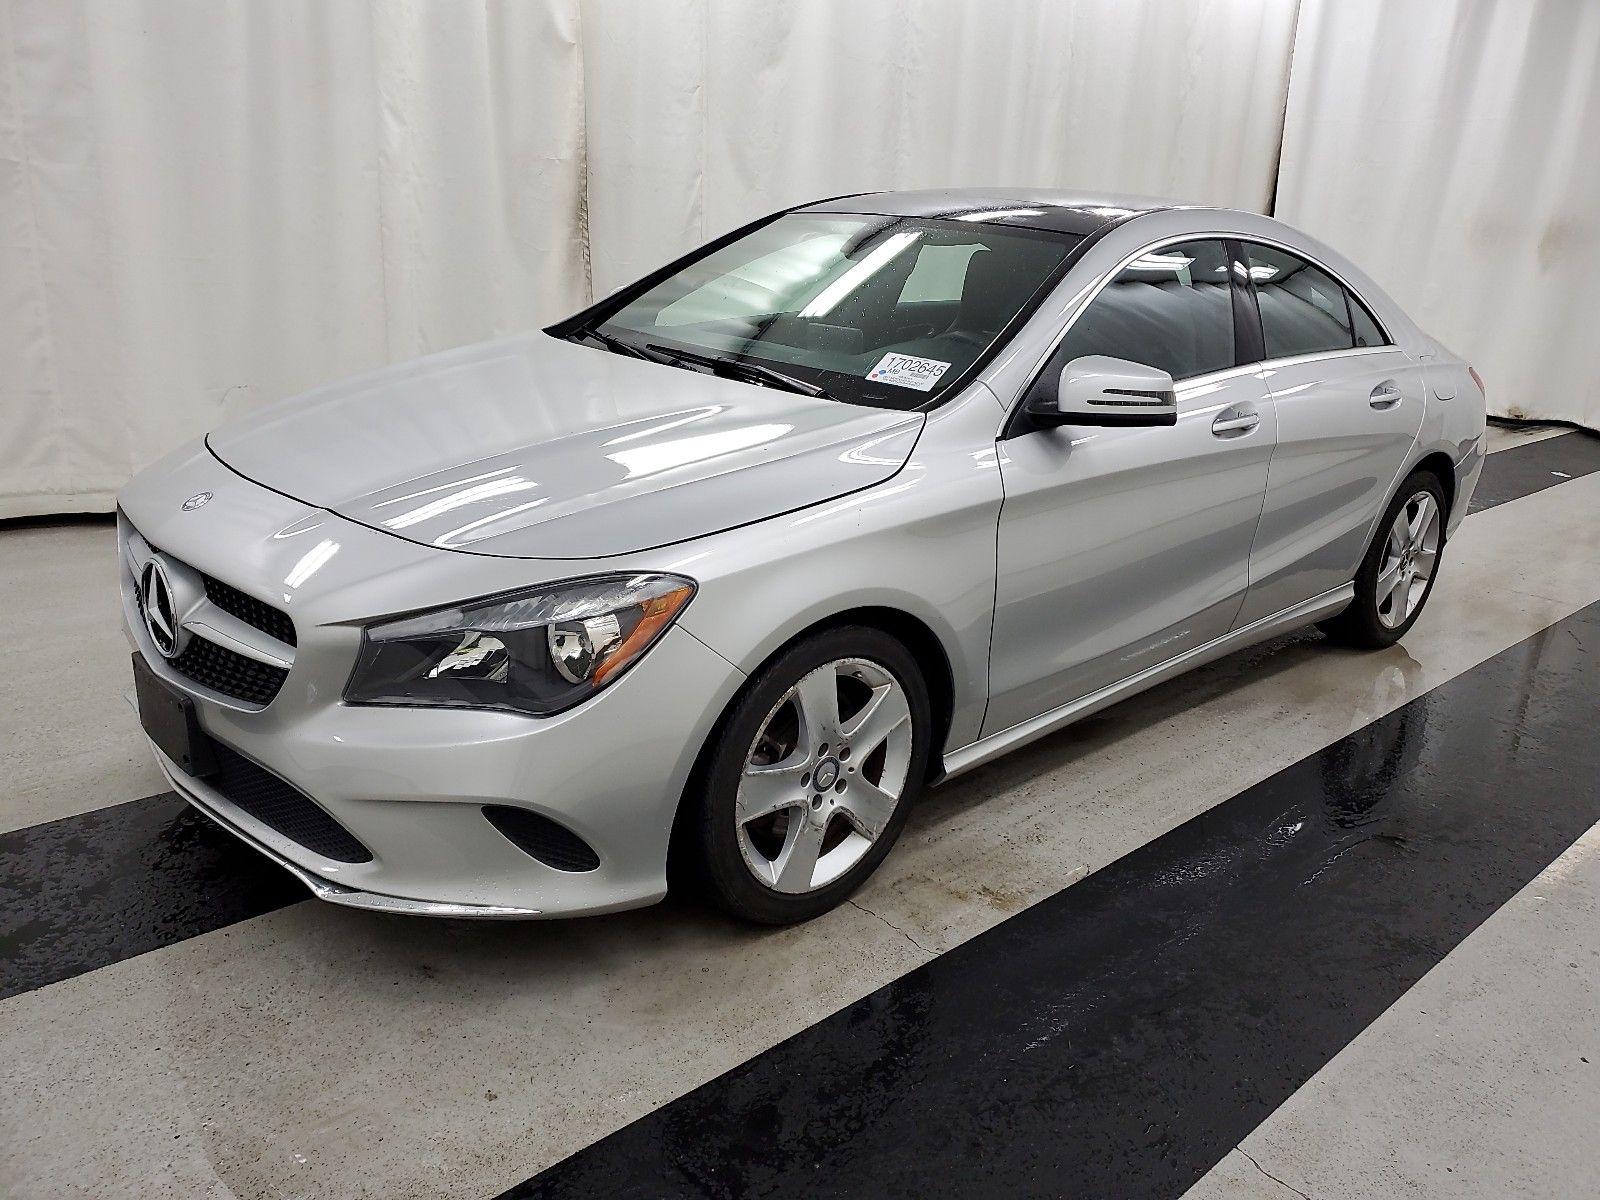 2017 Mercedes-benz Cla 2.0. Lot 99912131178 Vin WDDSJ4EB9HN463721